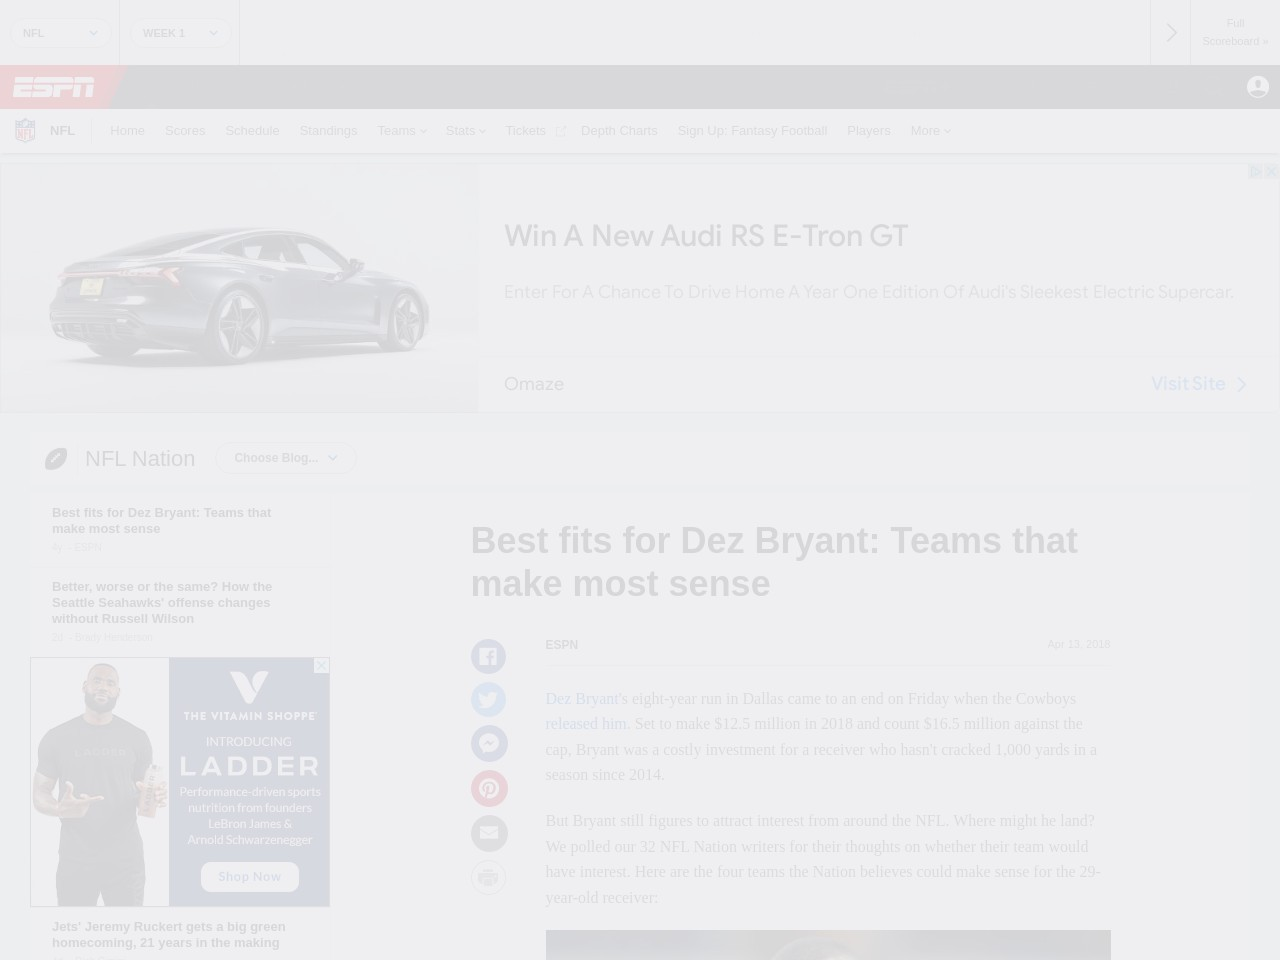 Best fits for Dez Bryant: Teams that make most sense